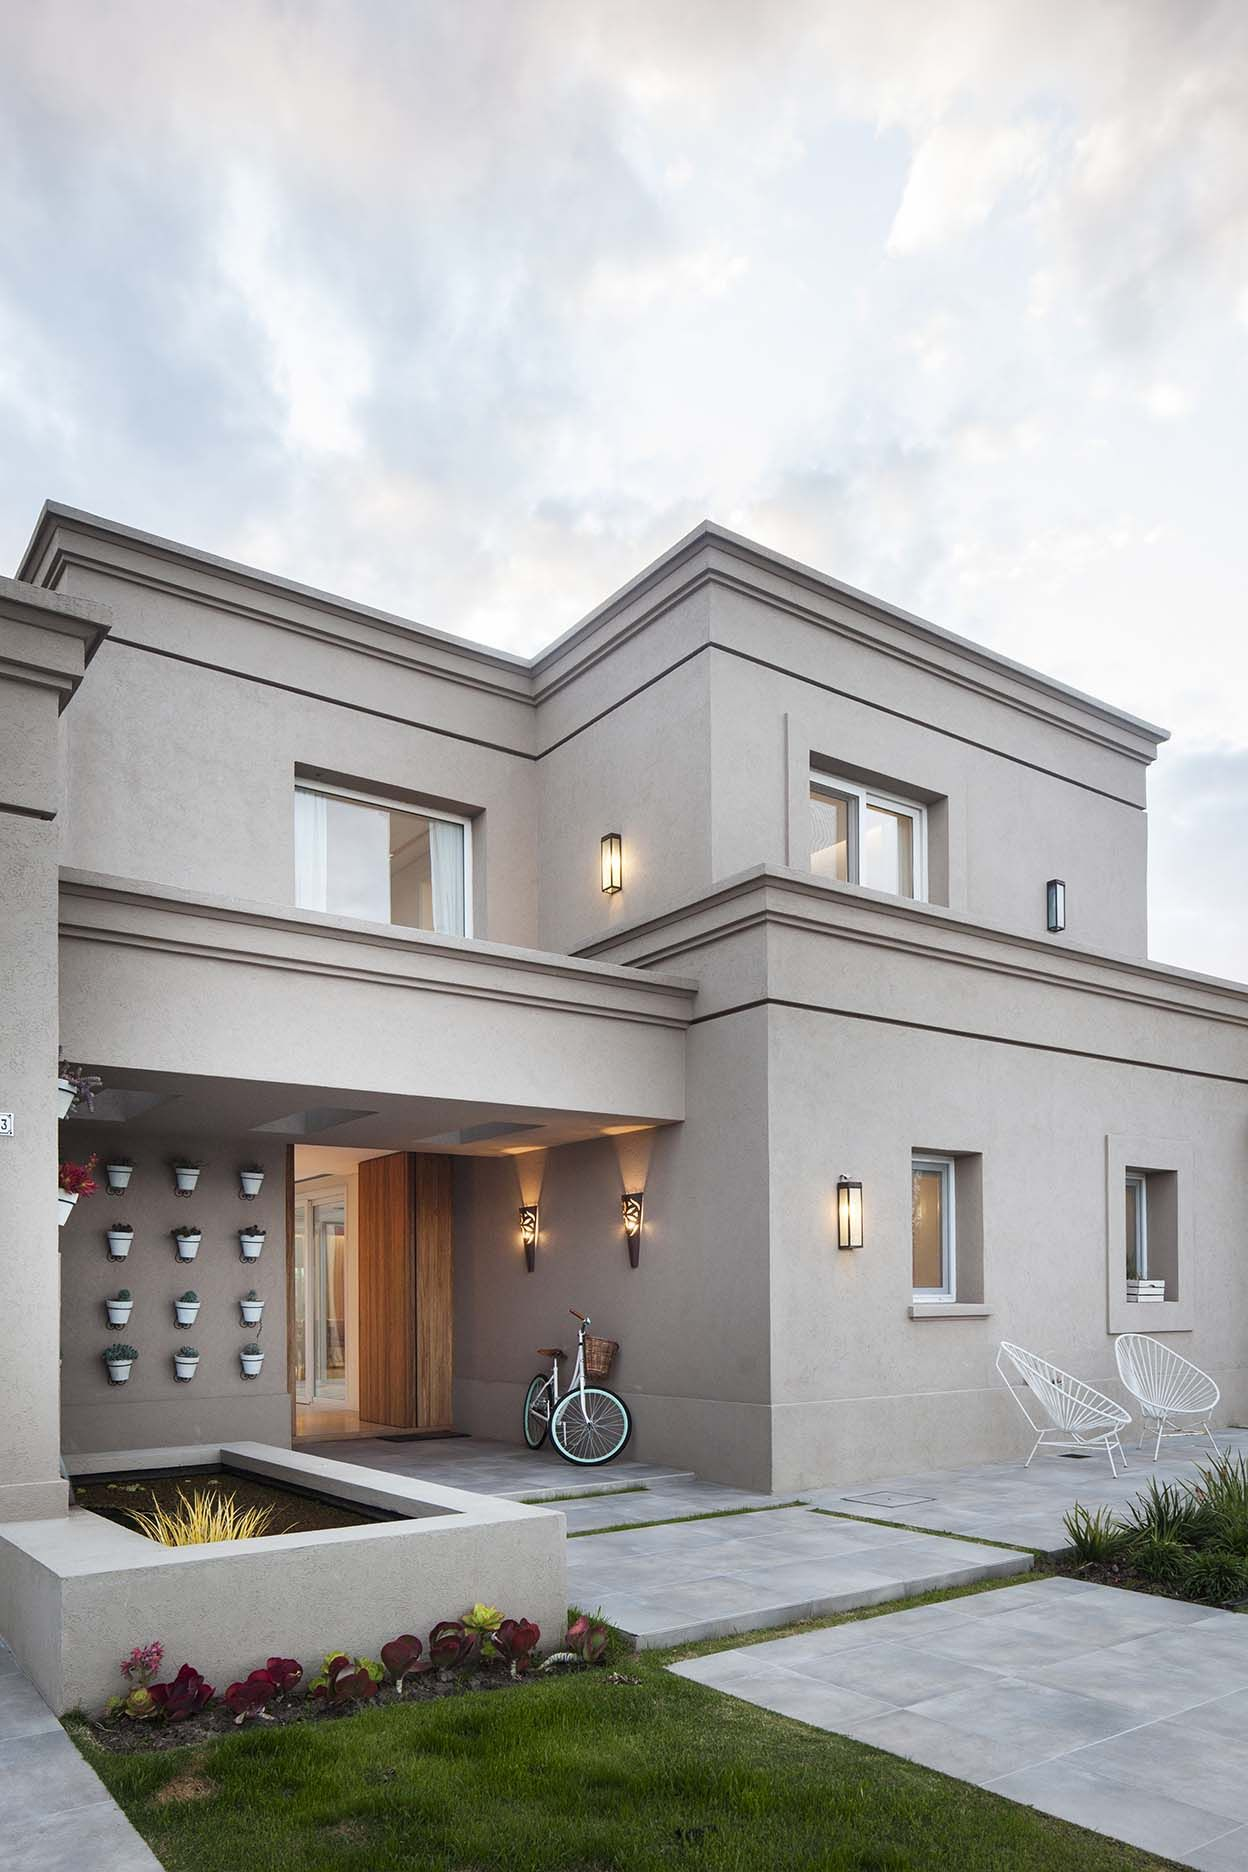 Color exterior ricardo pereyra iraola buenos aires for Casa moderna jardin d el menzah